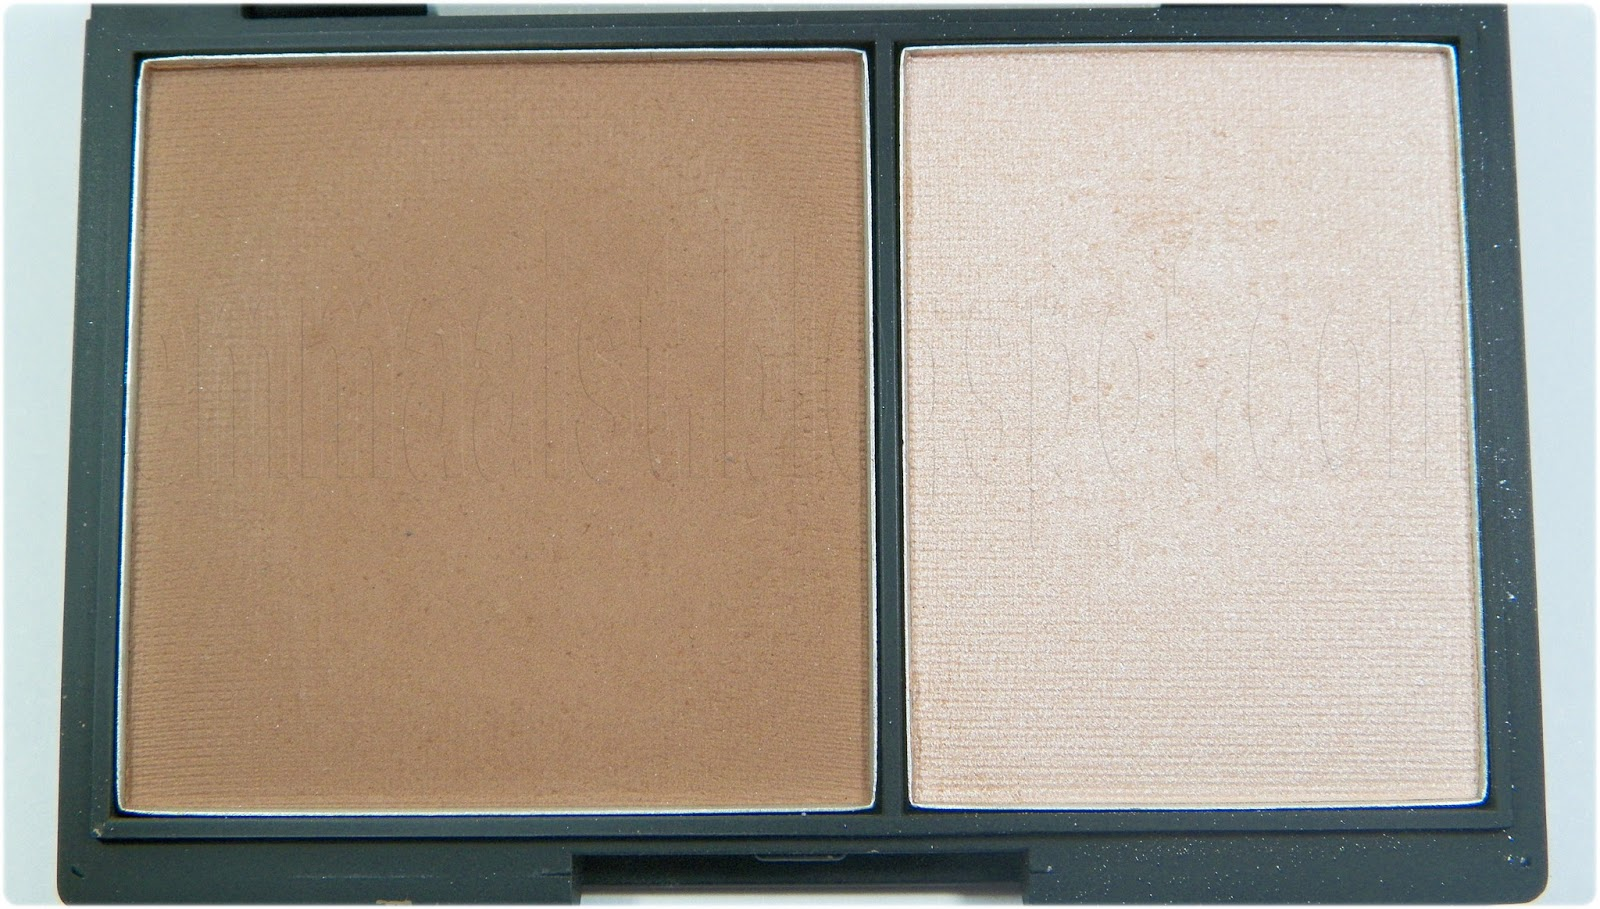 how to use sleek face contour kit